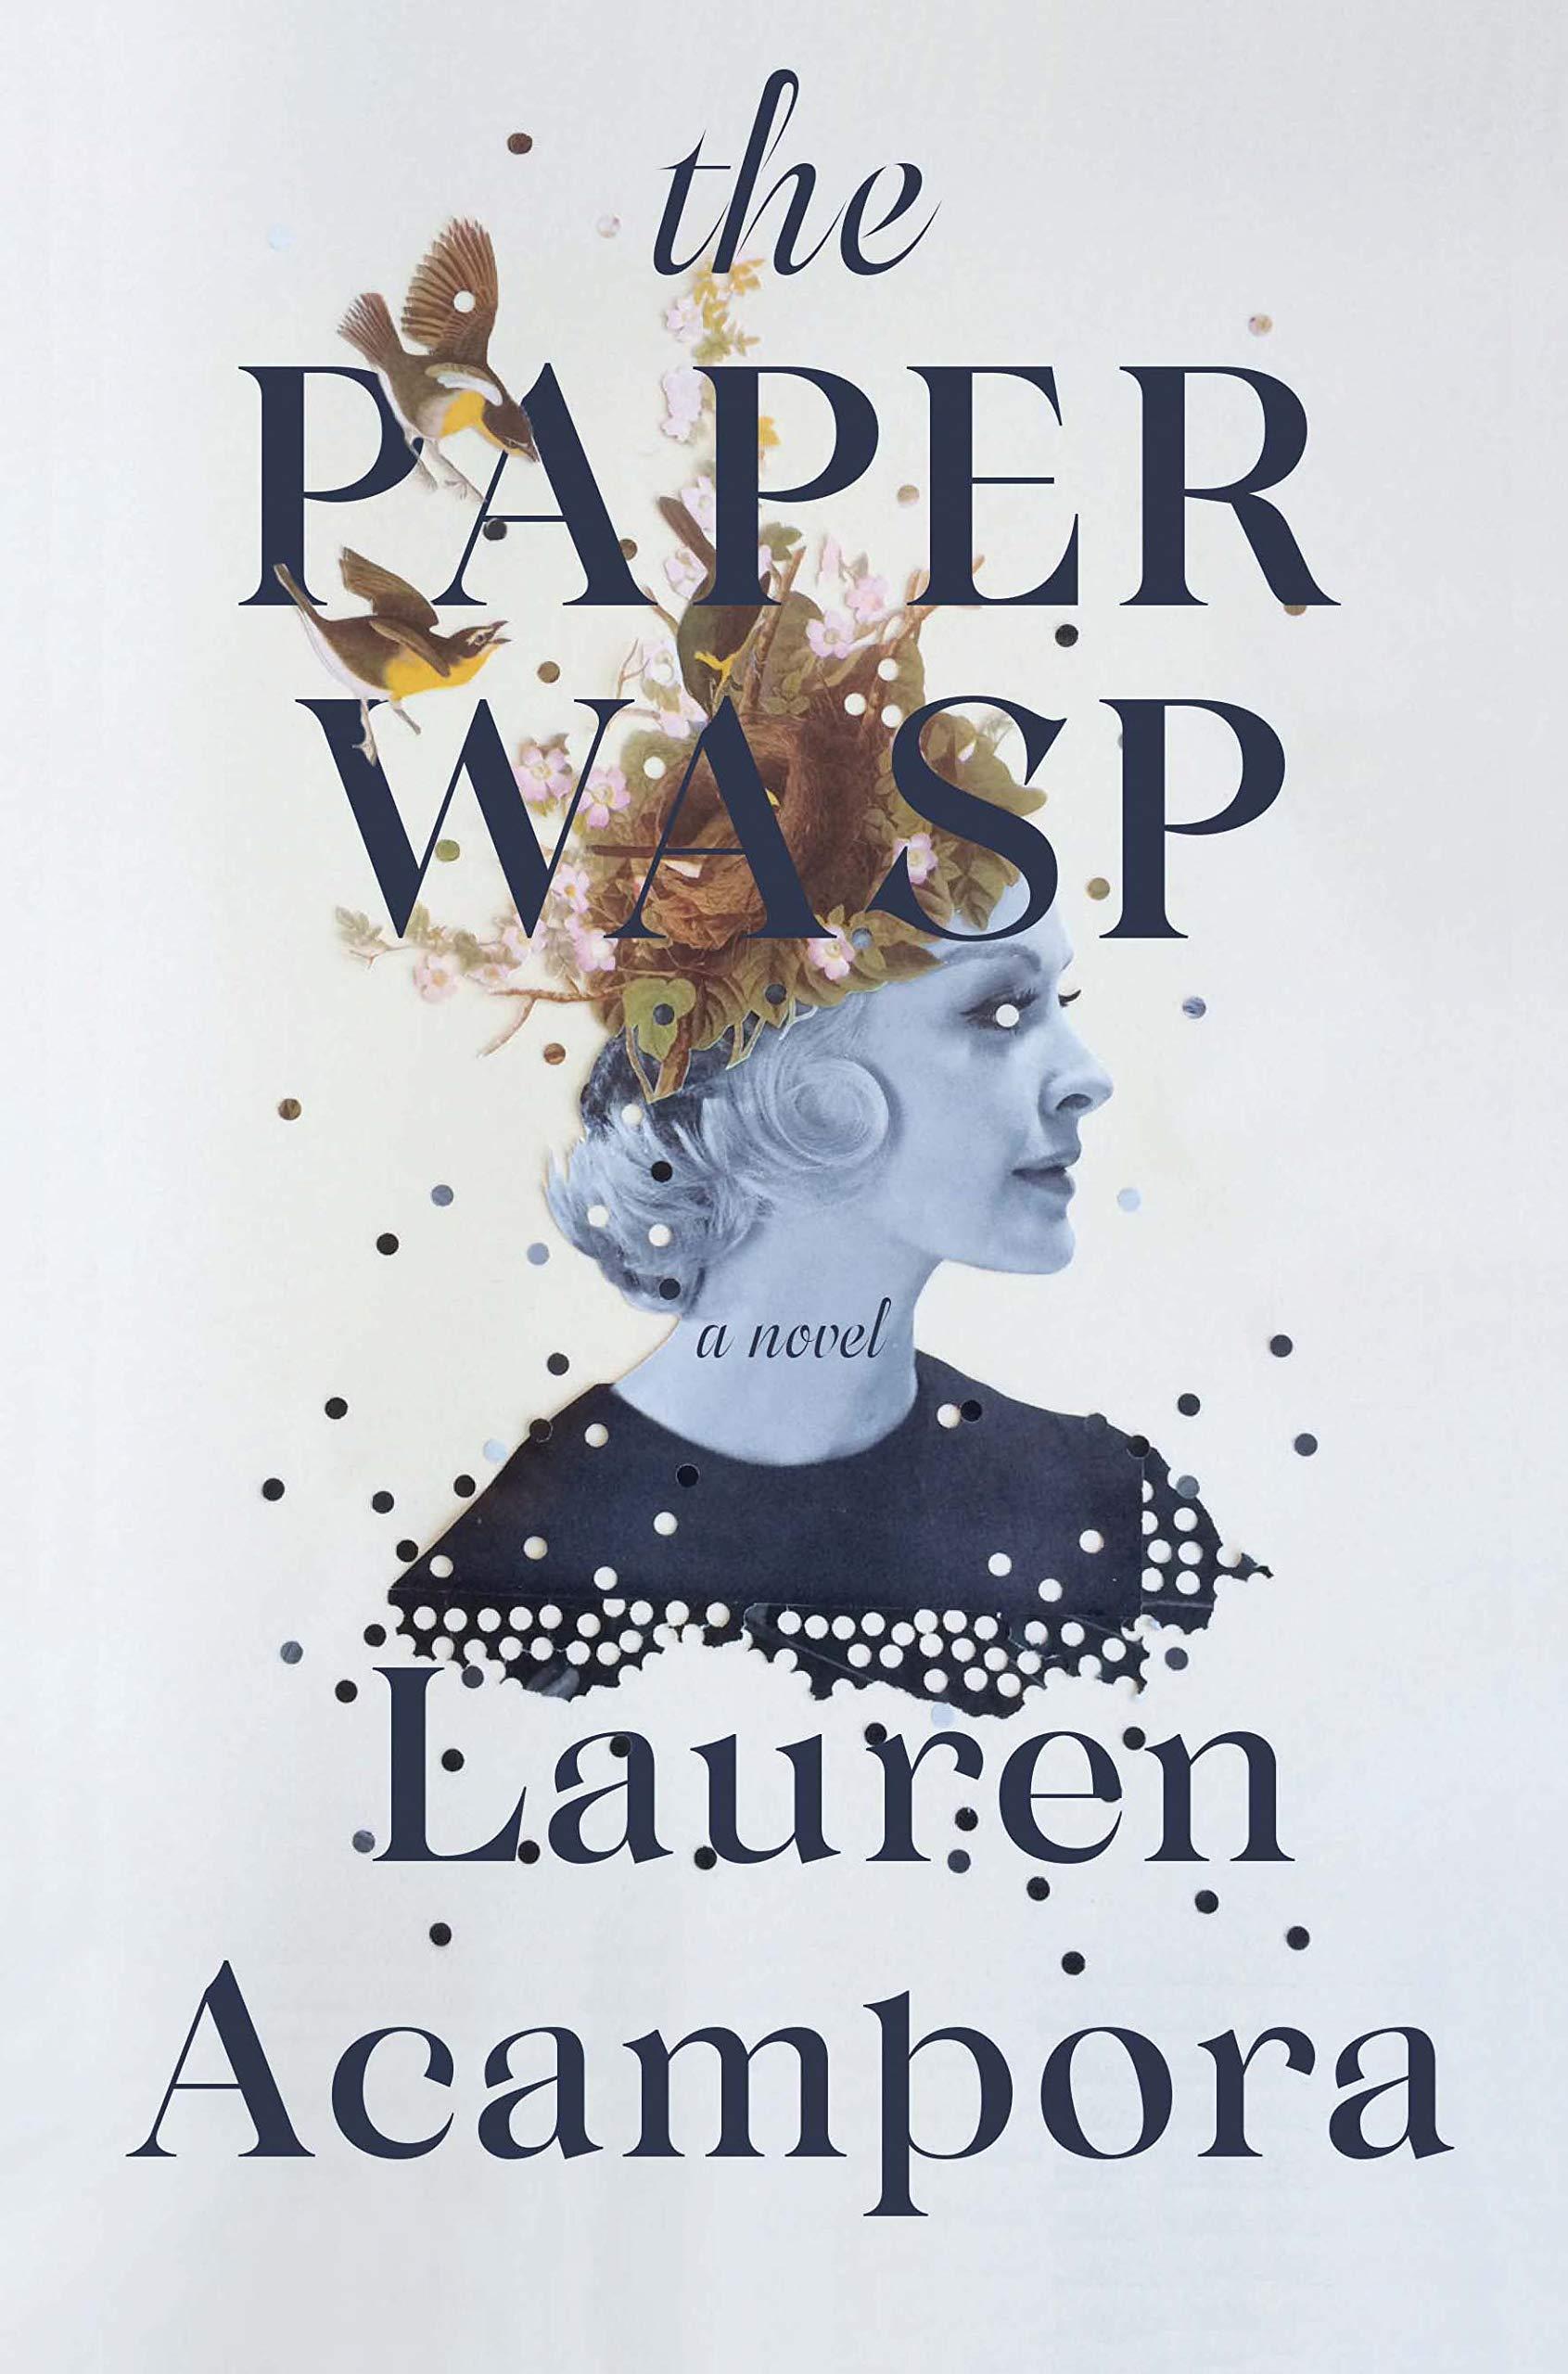 The Paper Wasp     by Lauren Acampora Grove Atlantic, 2019 book cover